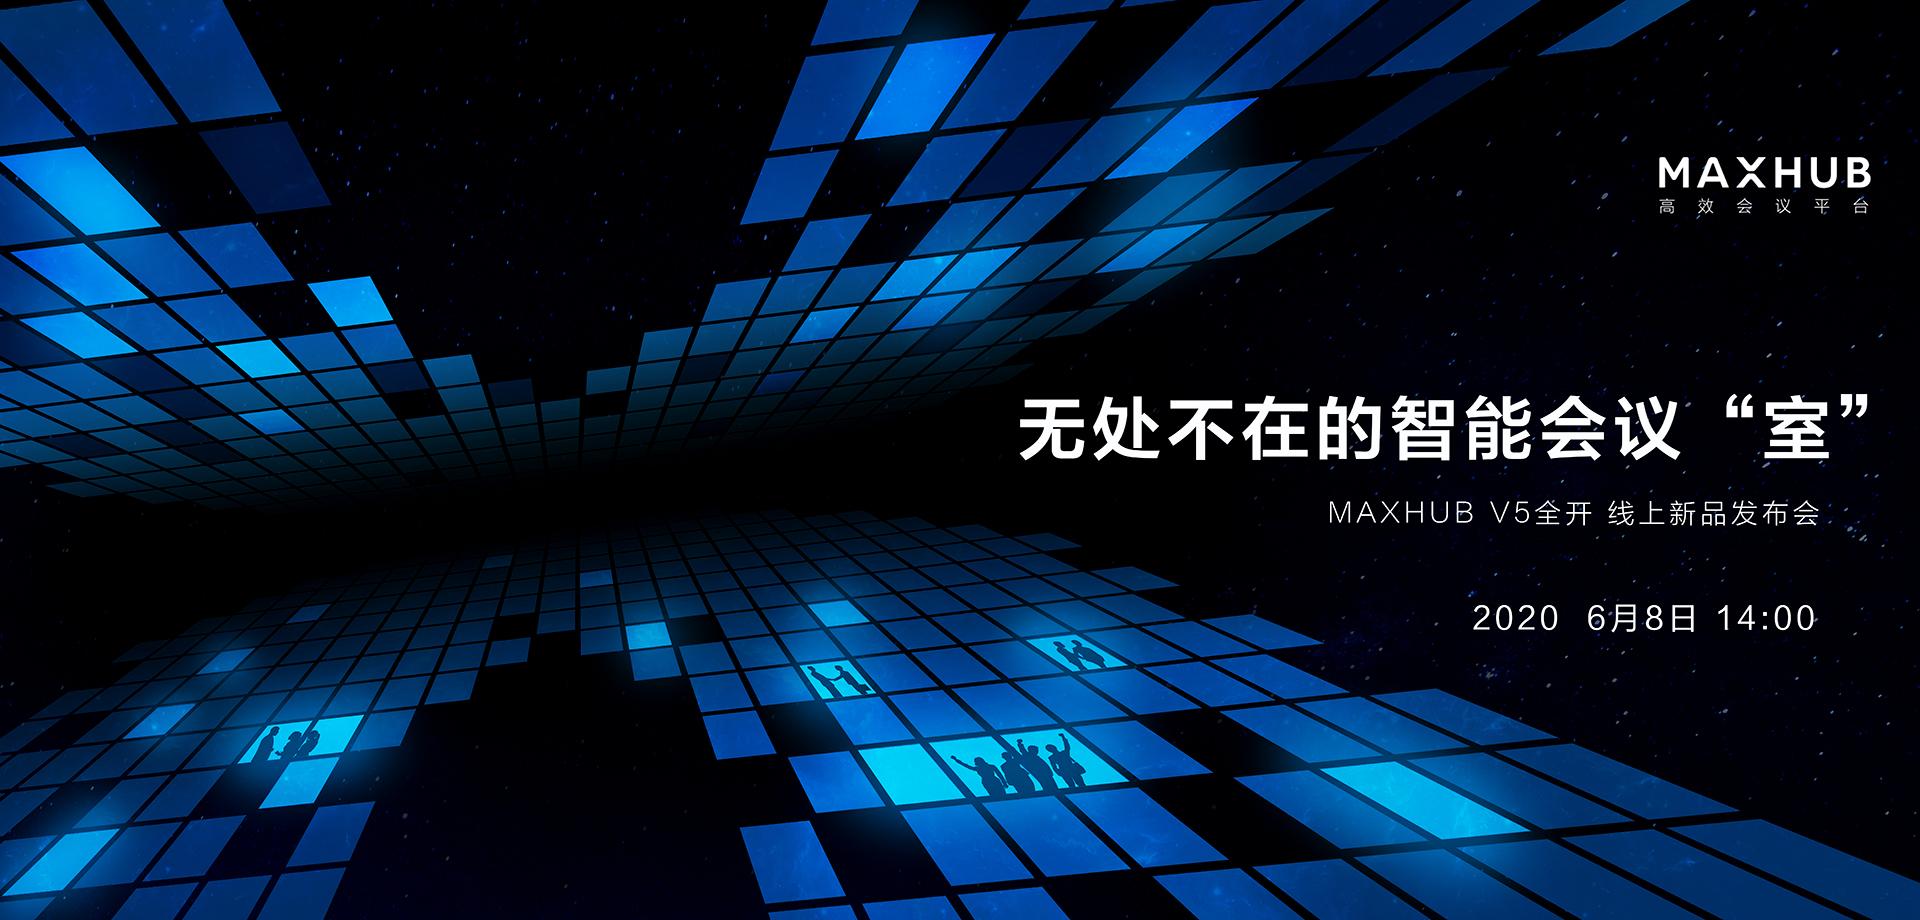 MAXHUB会议平板, banner